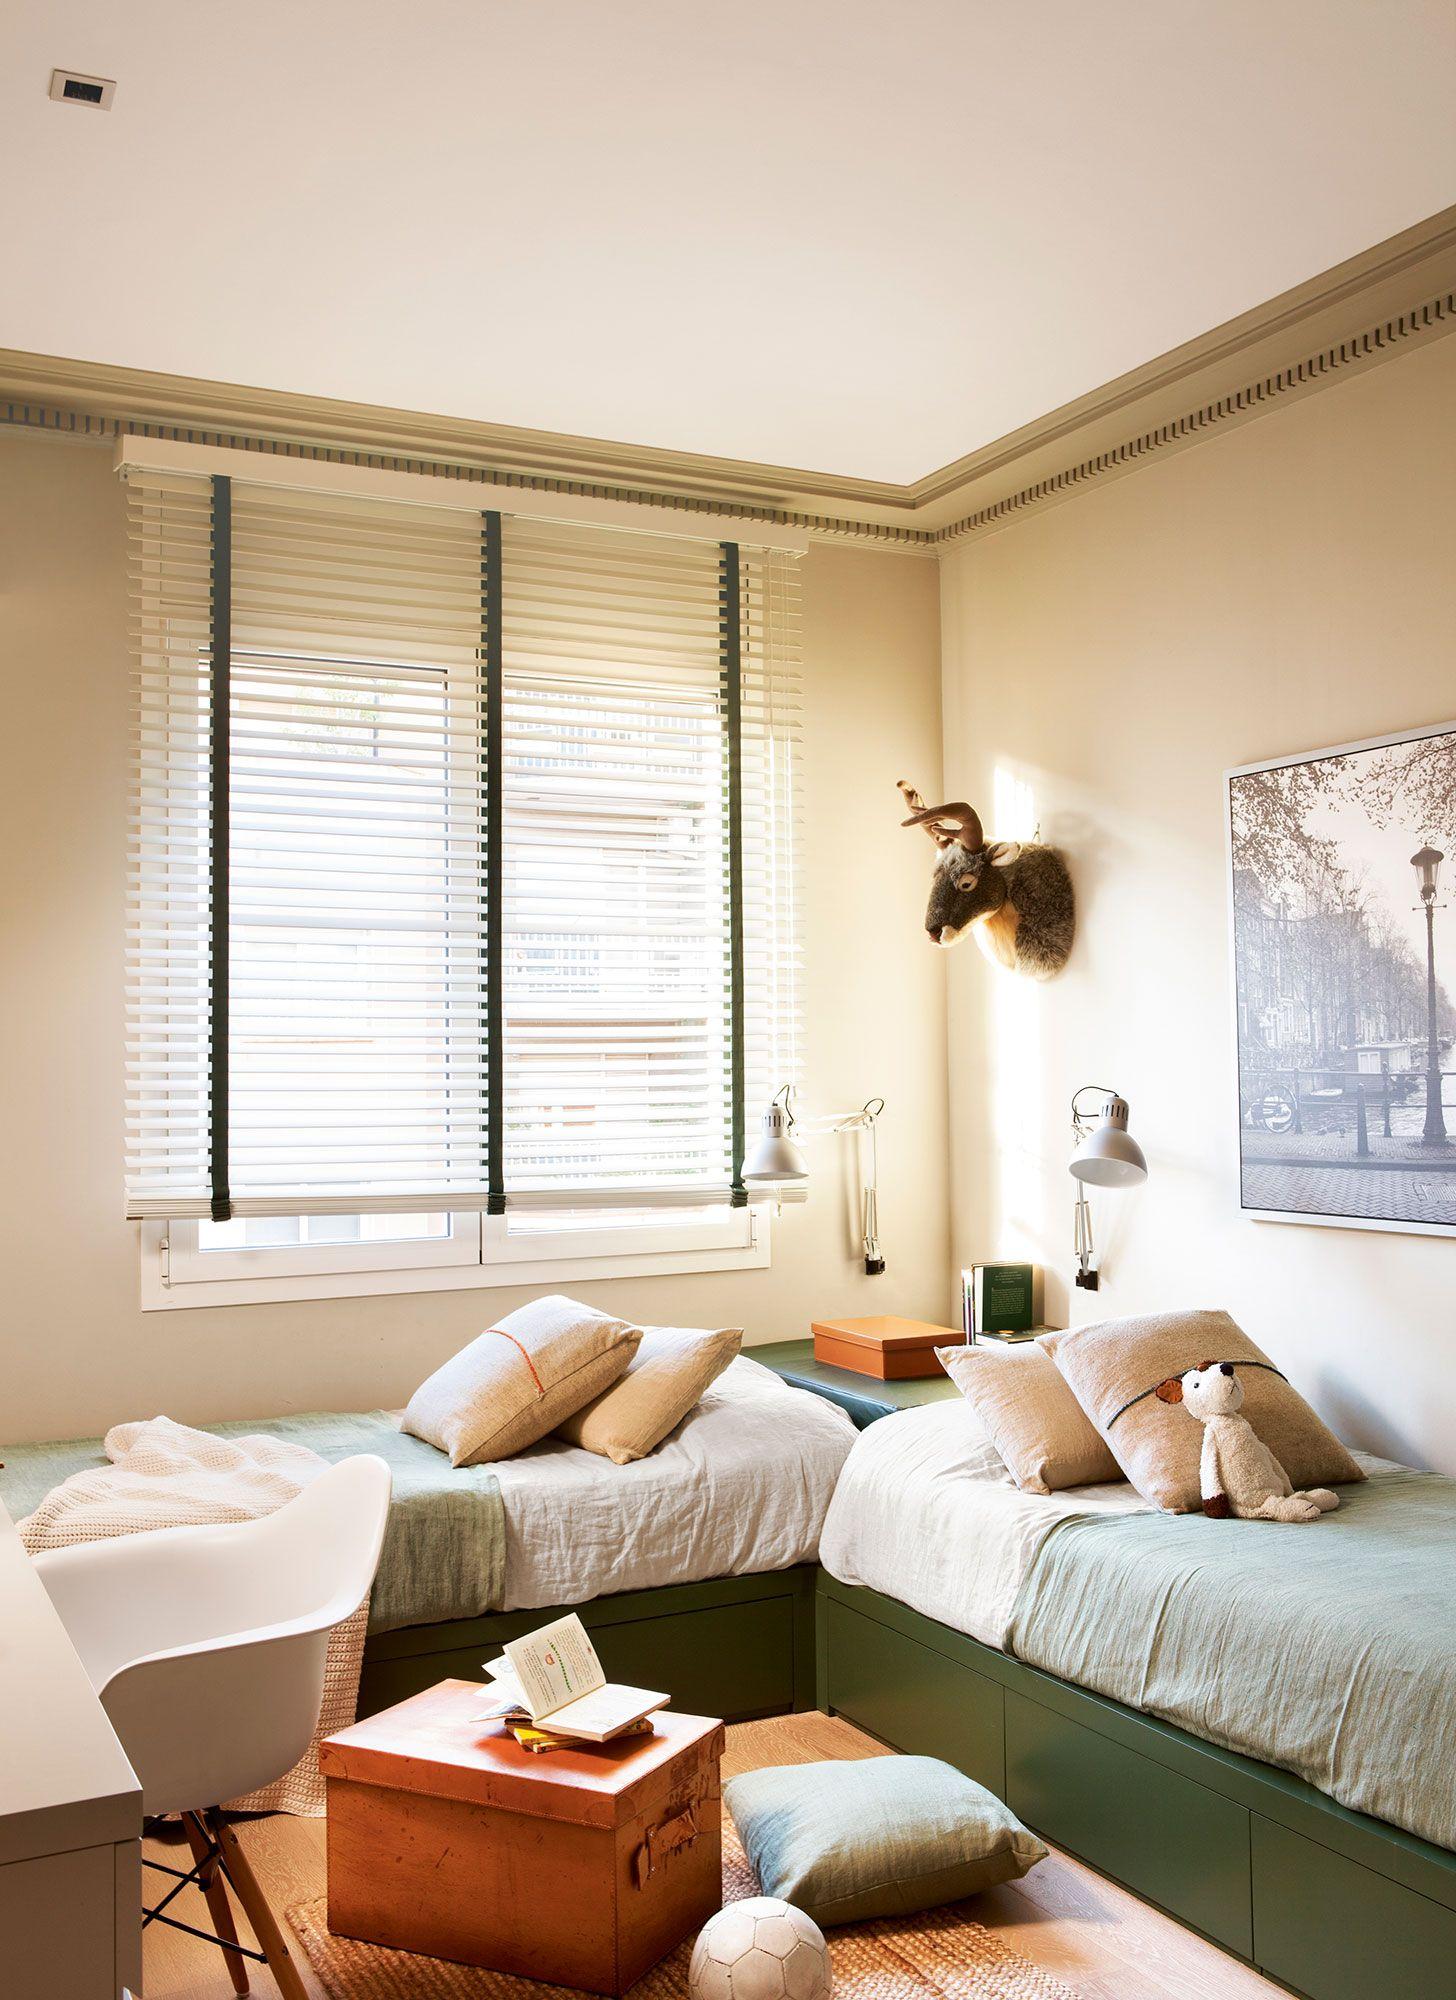 Buenas ideas para espacios compartidos | Pinterest | Habitación ...